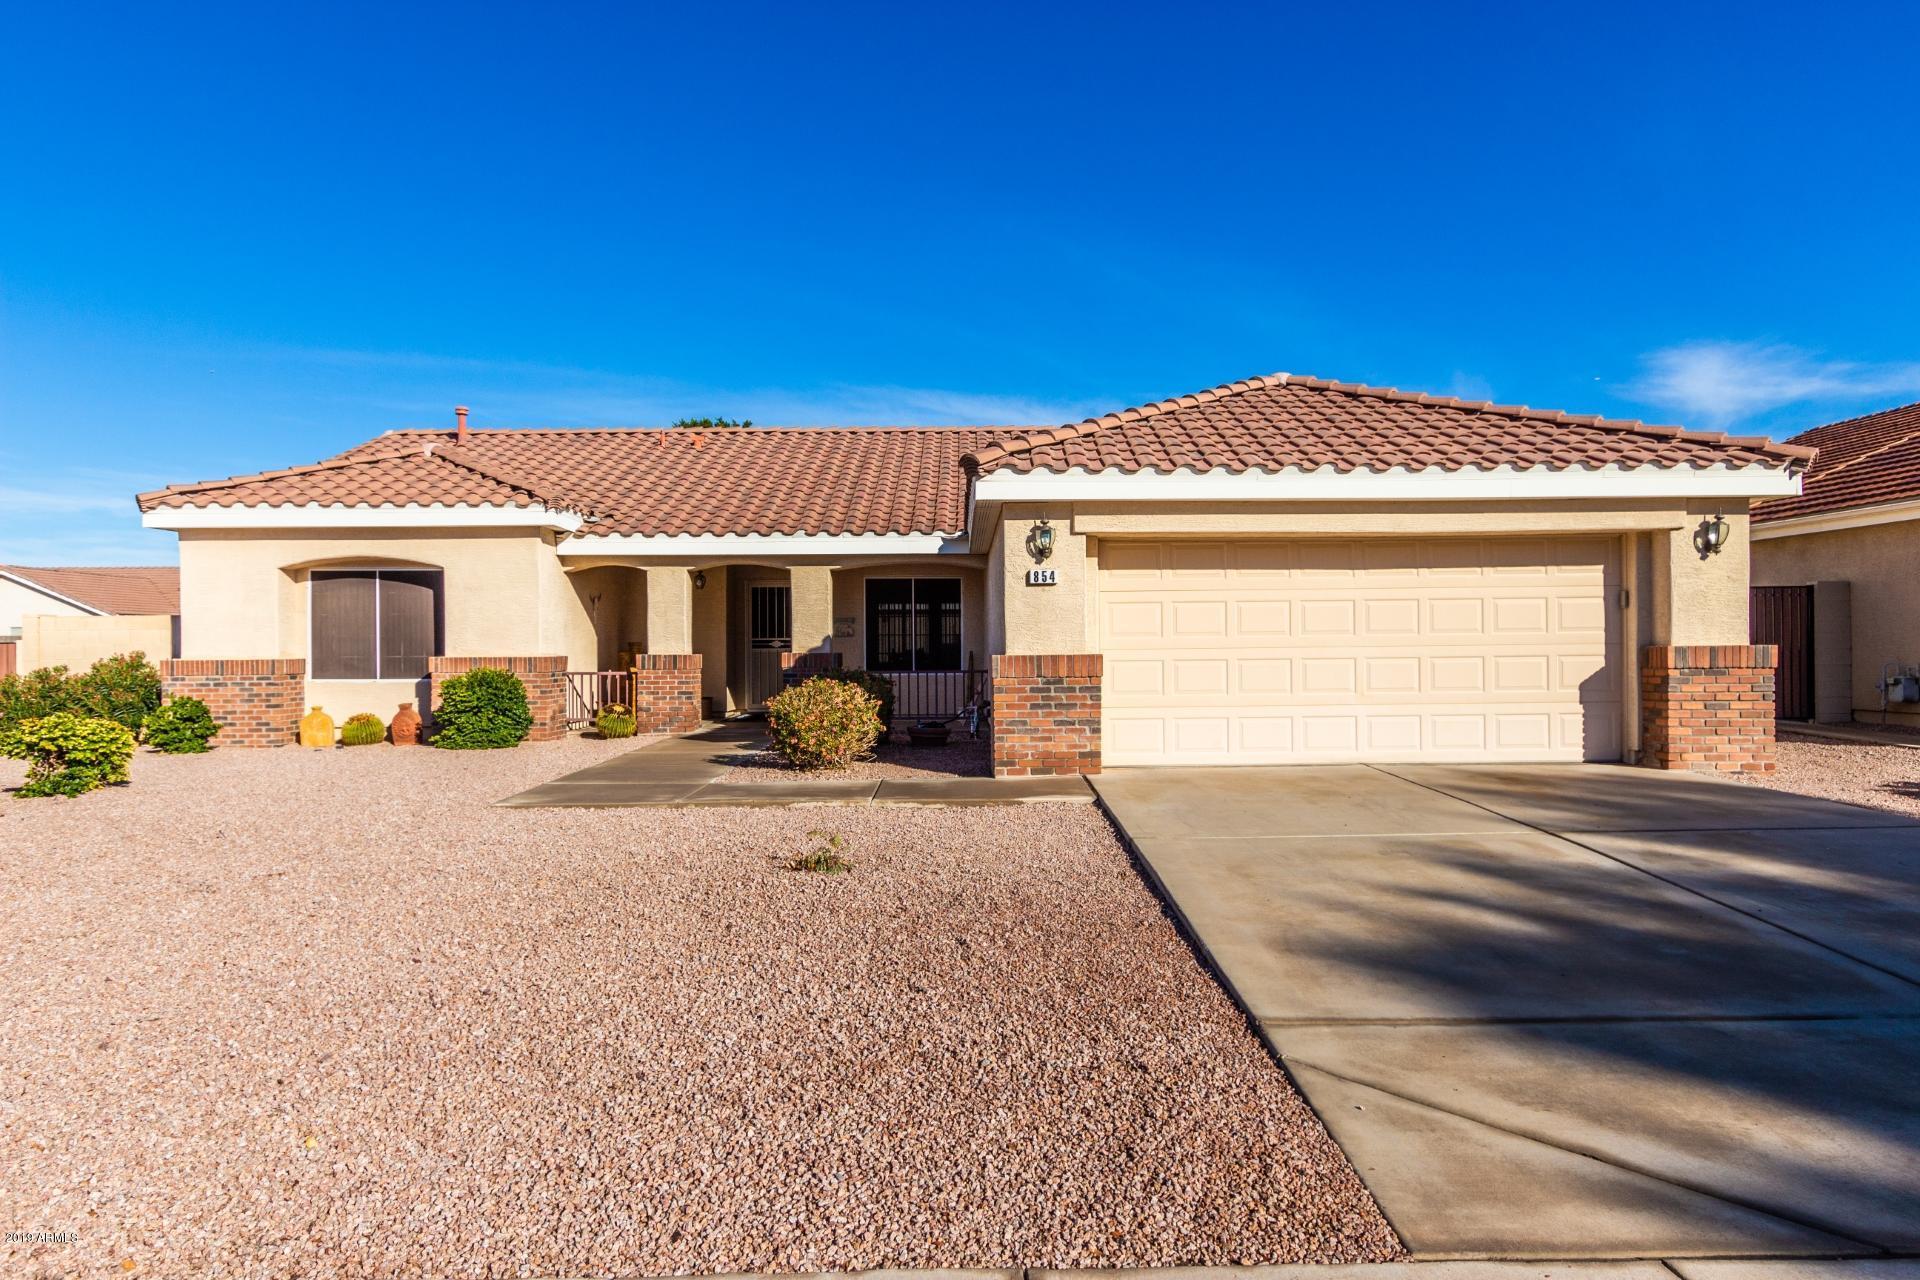 Photo of 854 W COOLEY Drive, Gilbert, AZ 85233